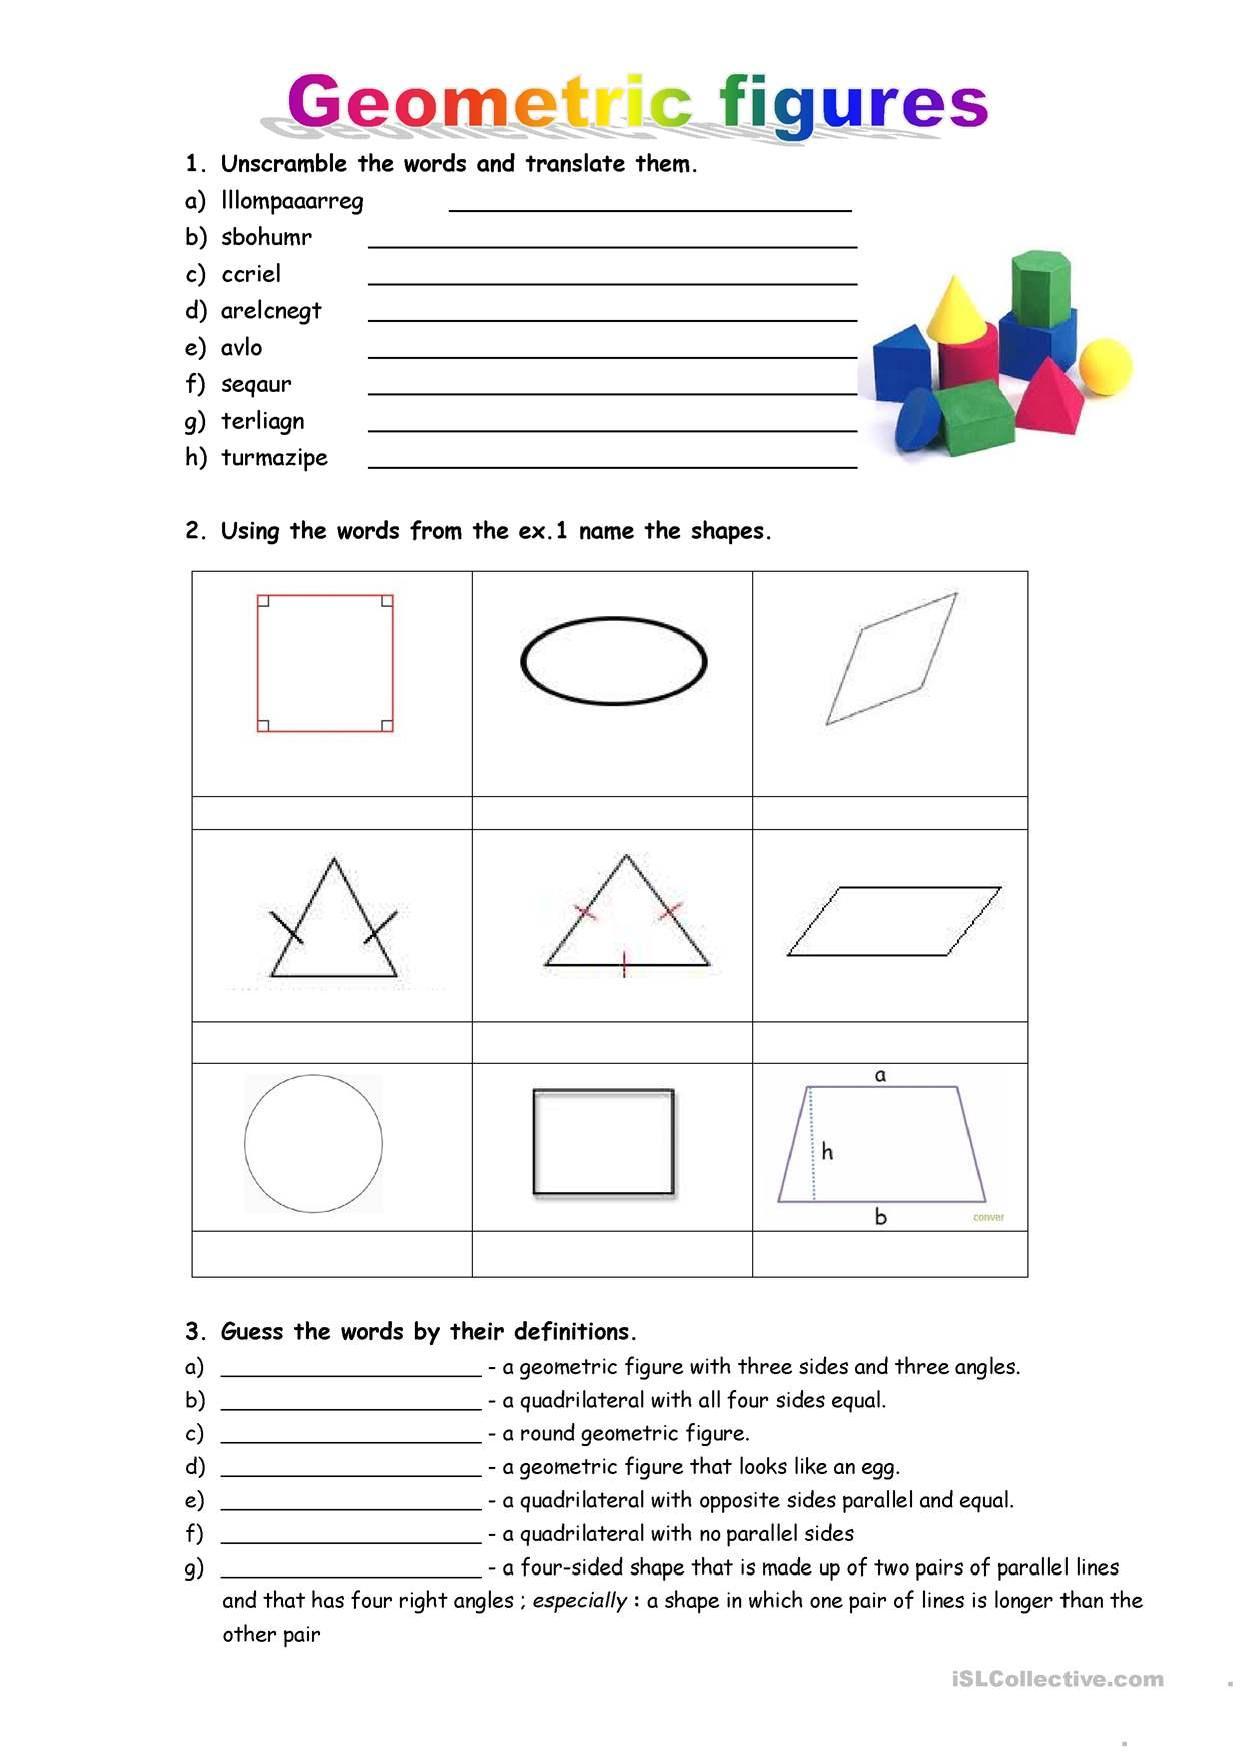 Geometrics Figures